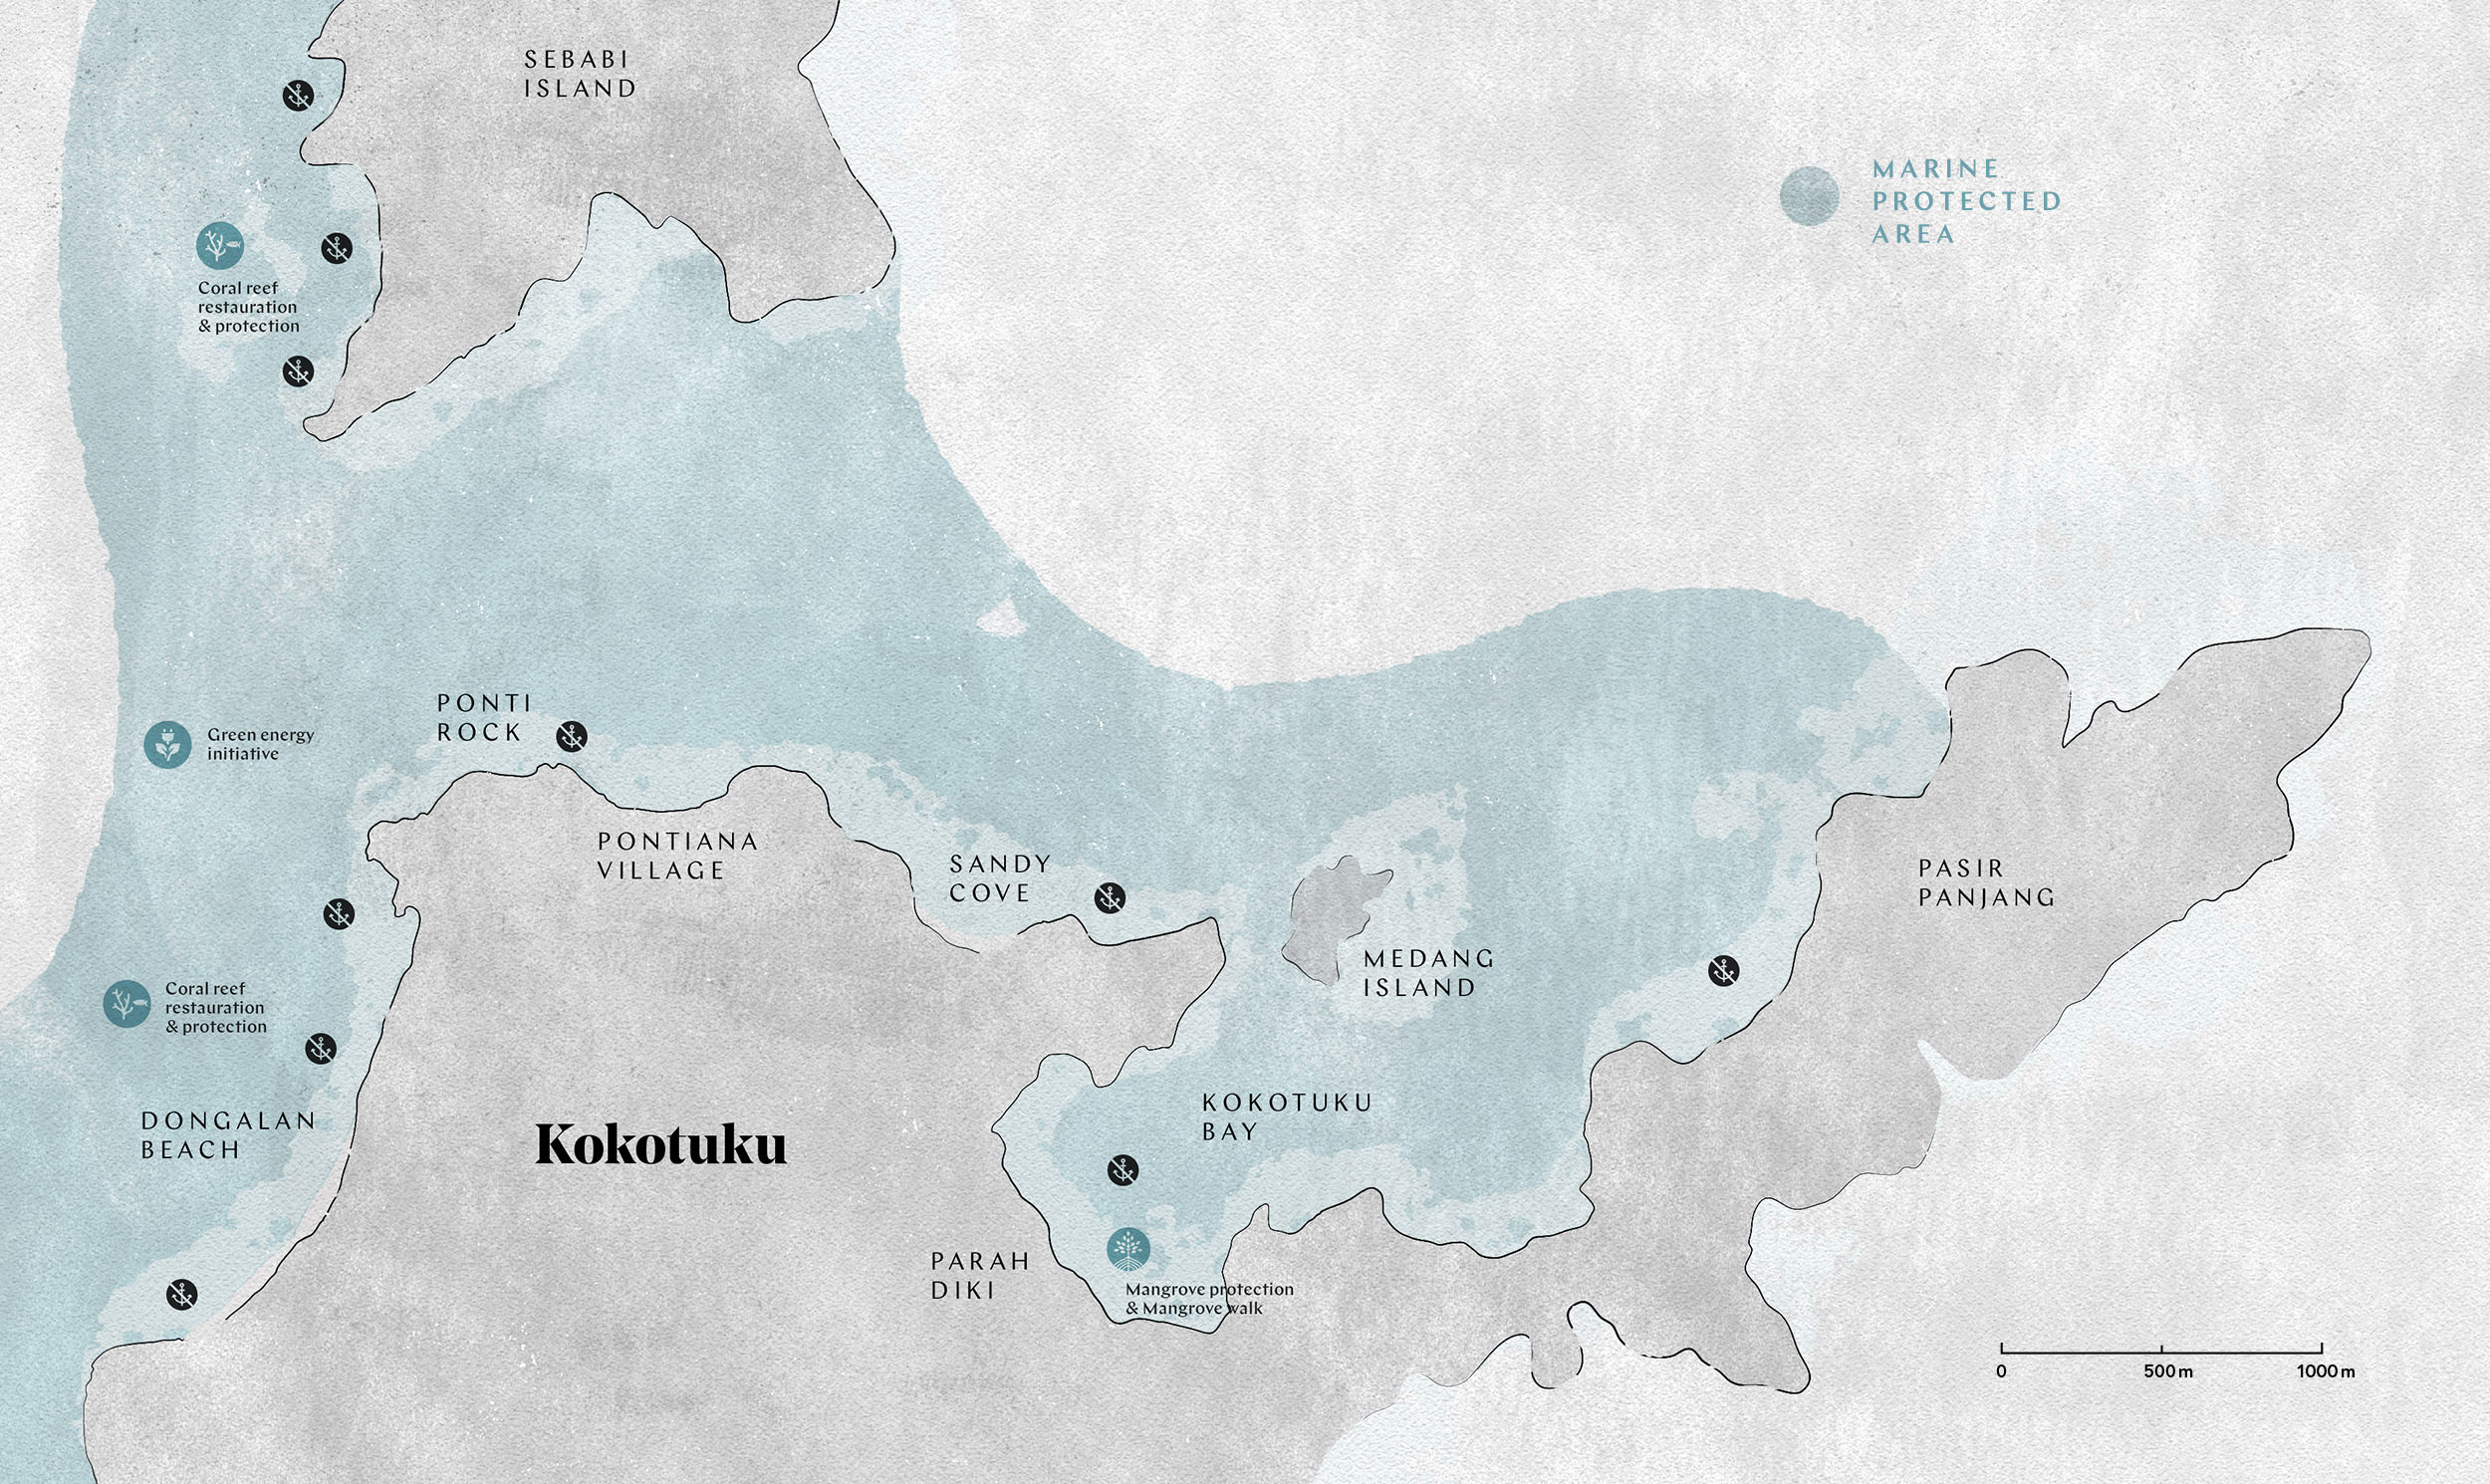 Kokotuku_Marine_protected_area_scale.jpg